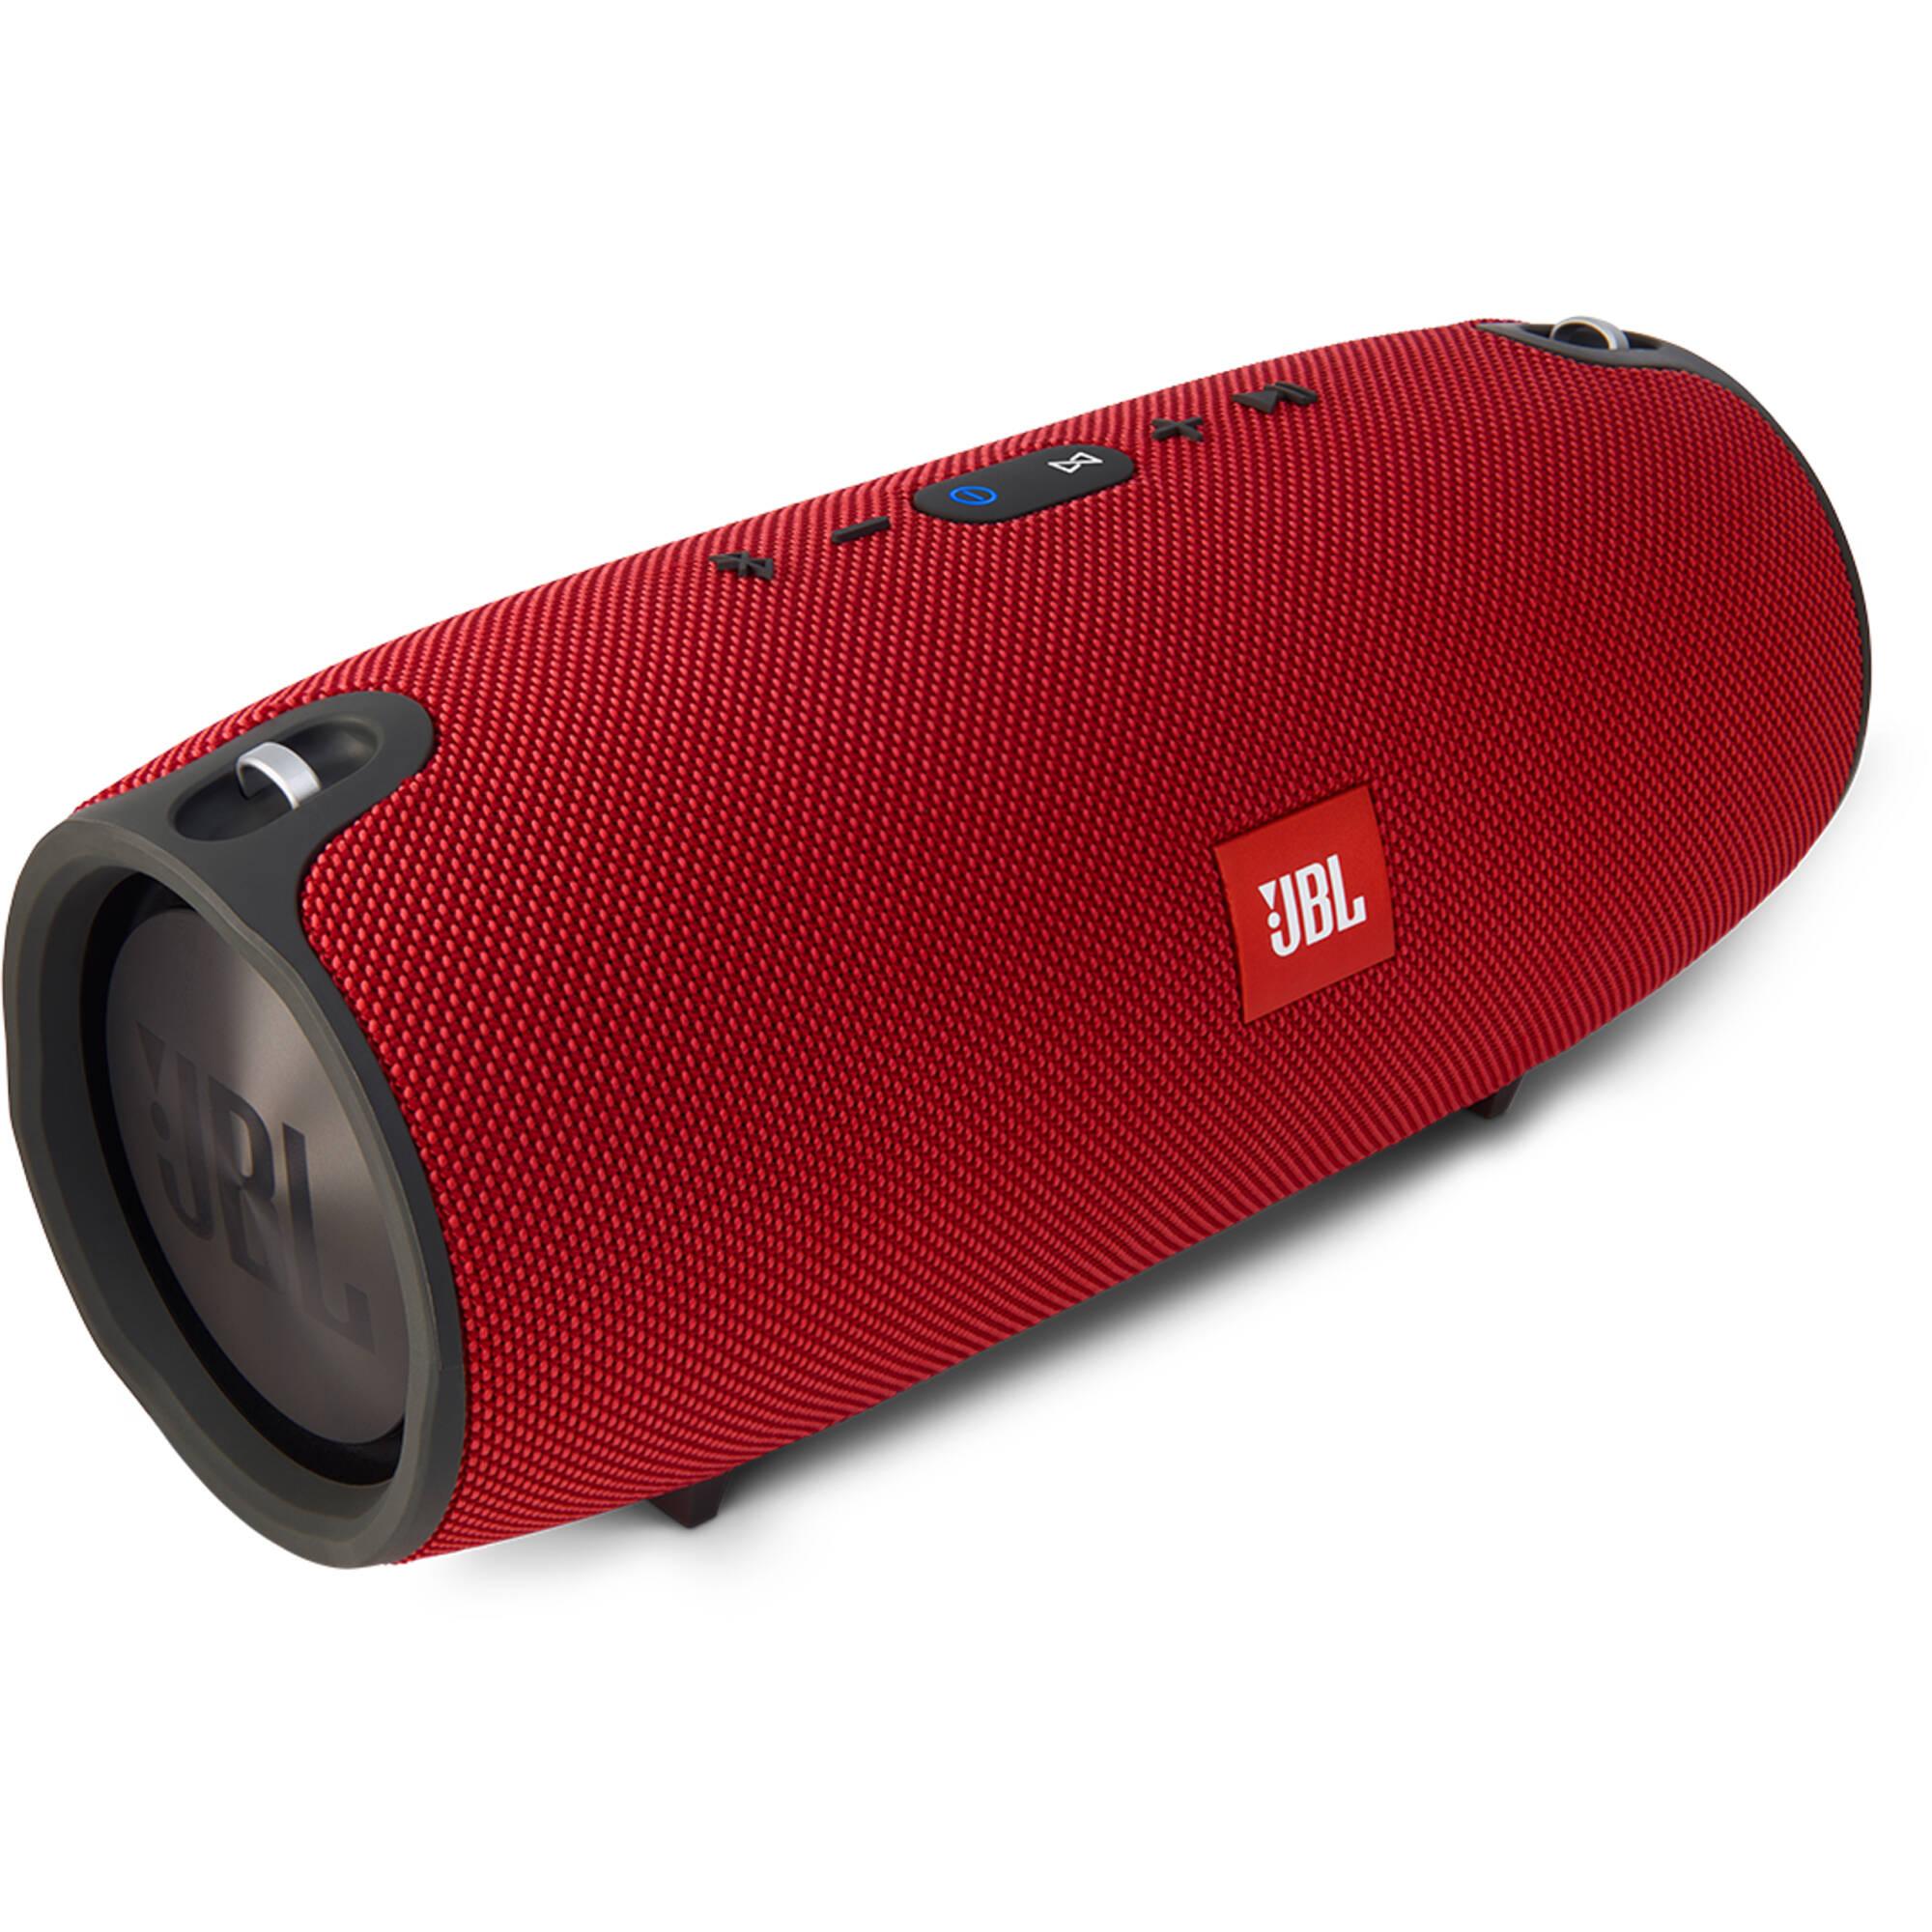 JBL Xtreme Portable Bluetooth Speaker (Red) JBLXTREMEREDUS B&H